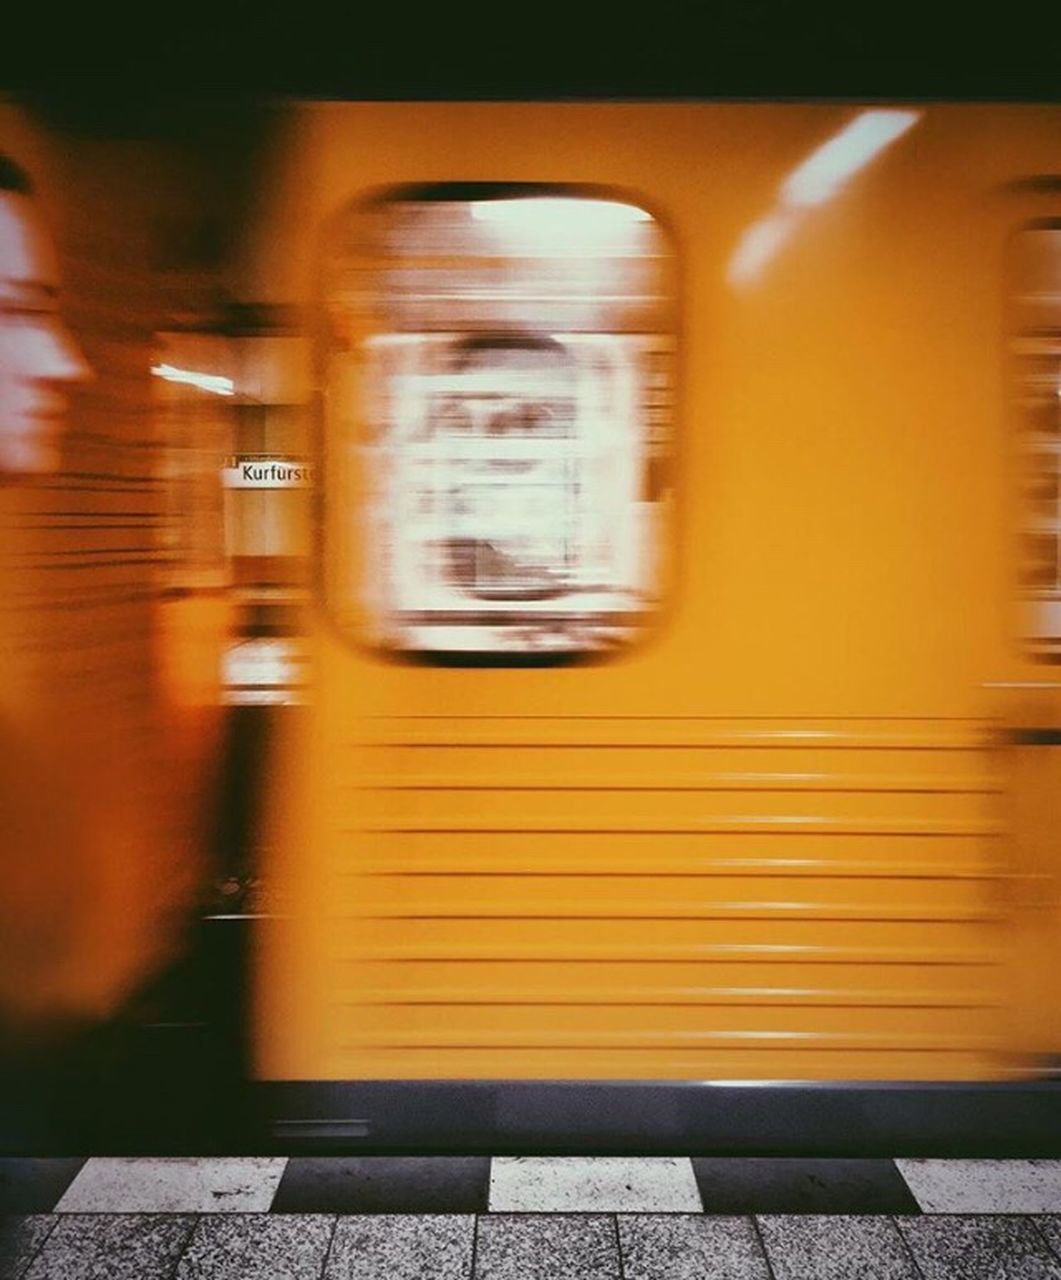 blurred motion, transportation, train - vehicle, public transportation, speed, mode of transport, rail transportation, motion, passenger train, railroad station platform, railroad station, day, outdoors, yellow, no people, subway train